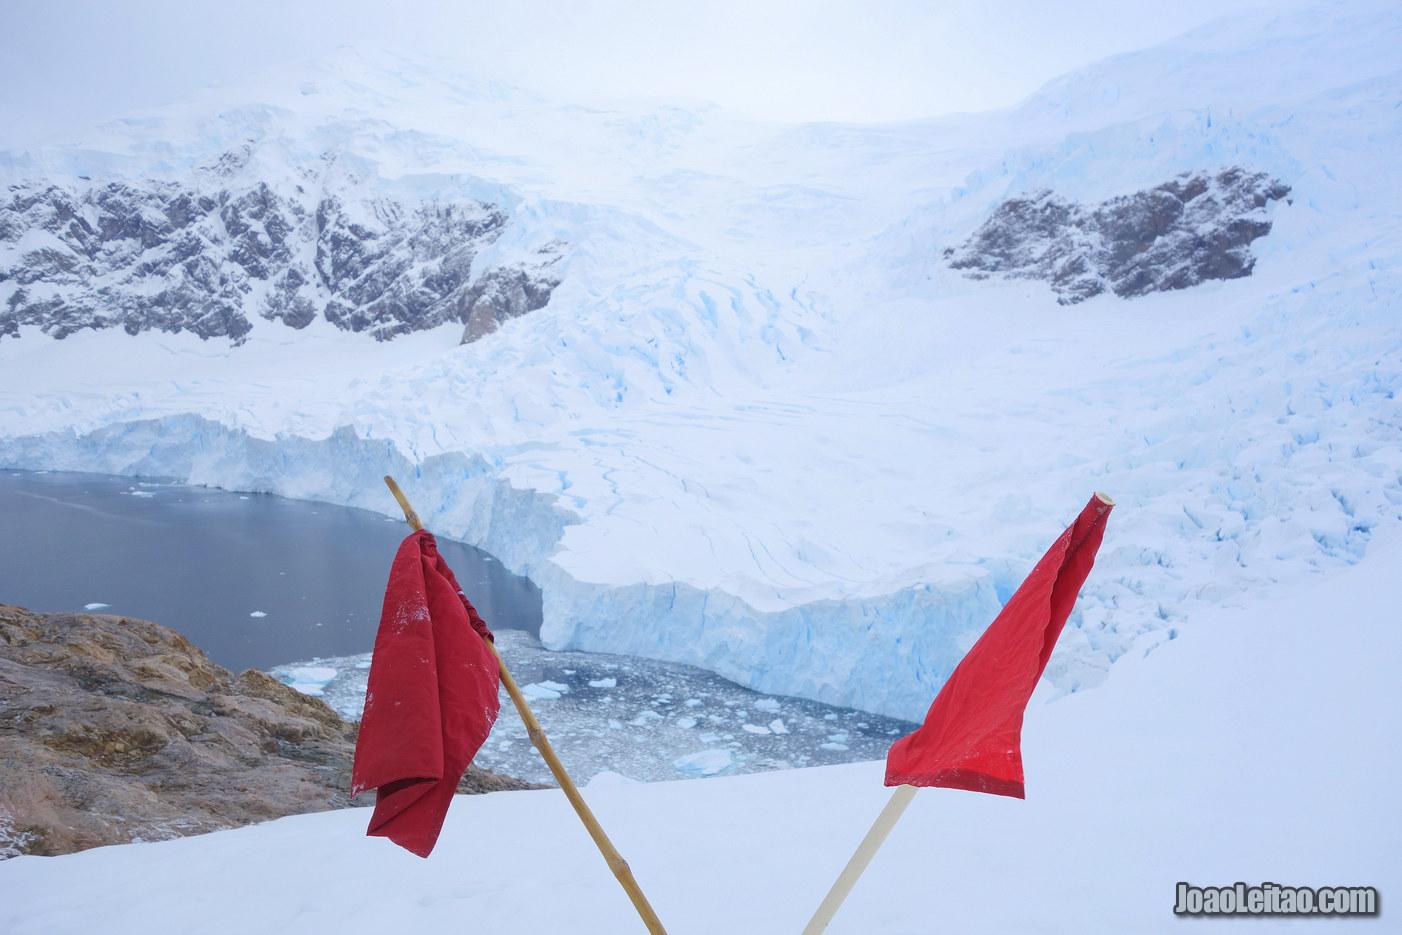 Visit Antarctica in December